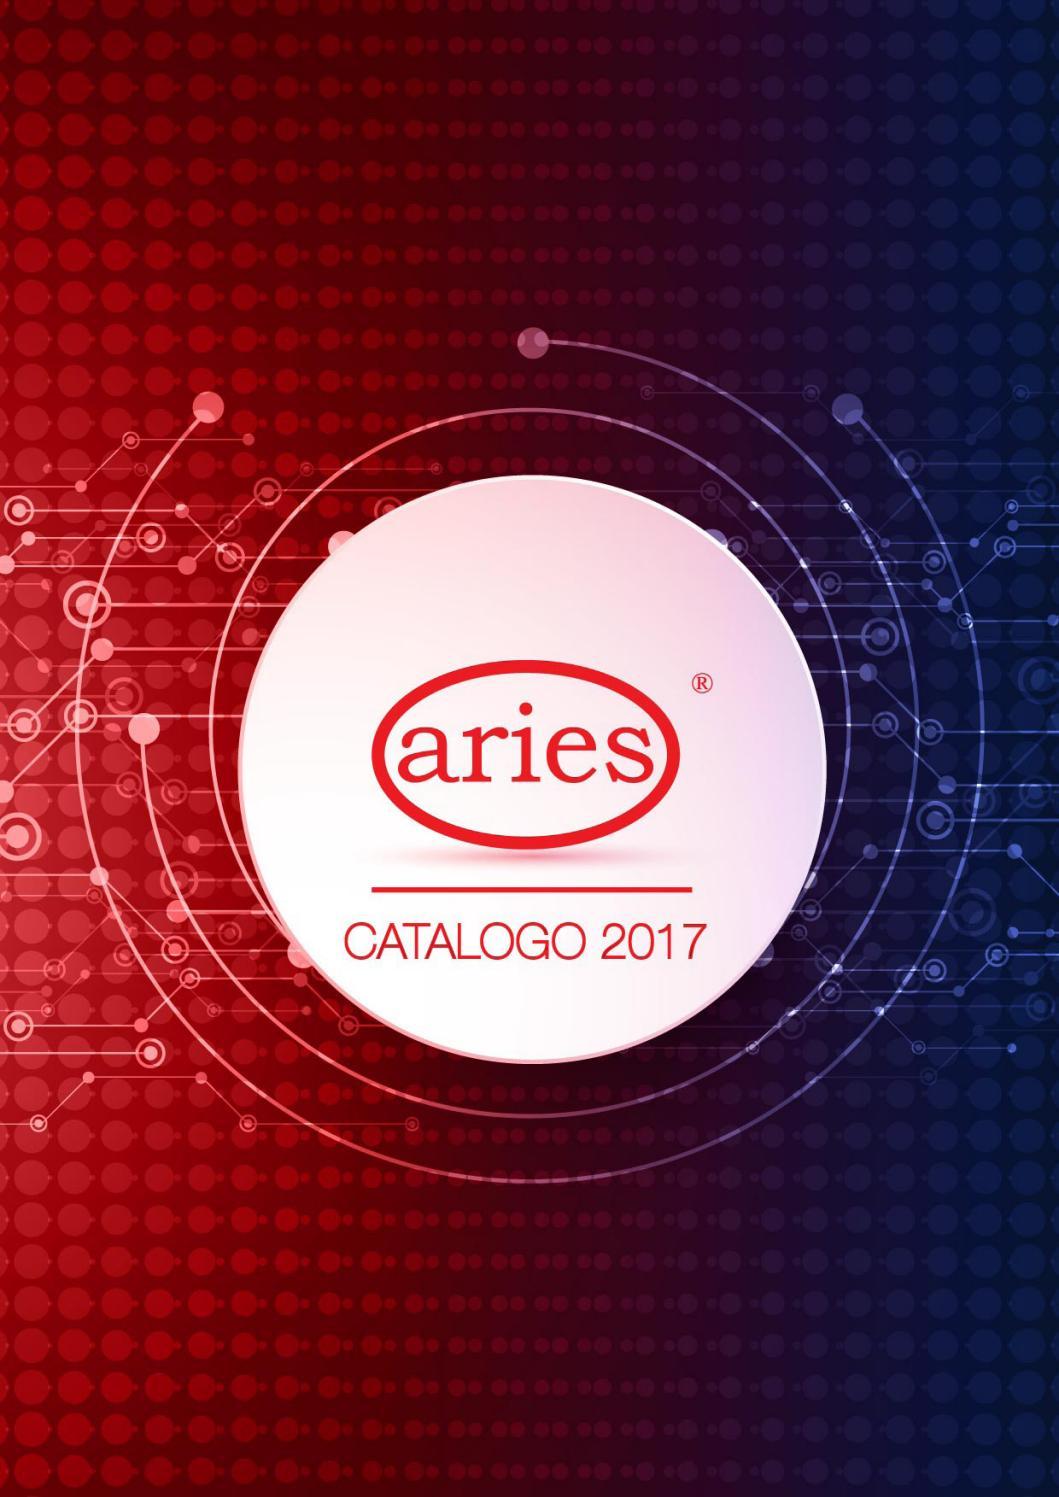 Catálogo Aries 2017 by Industrias Sur - issuu eb38d79f98d